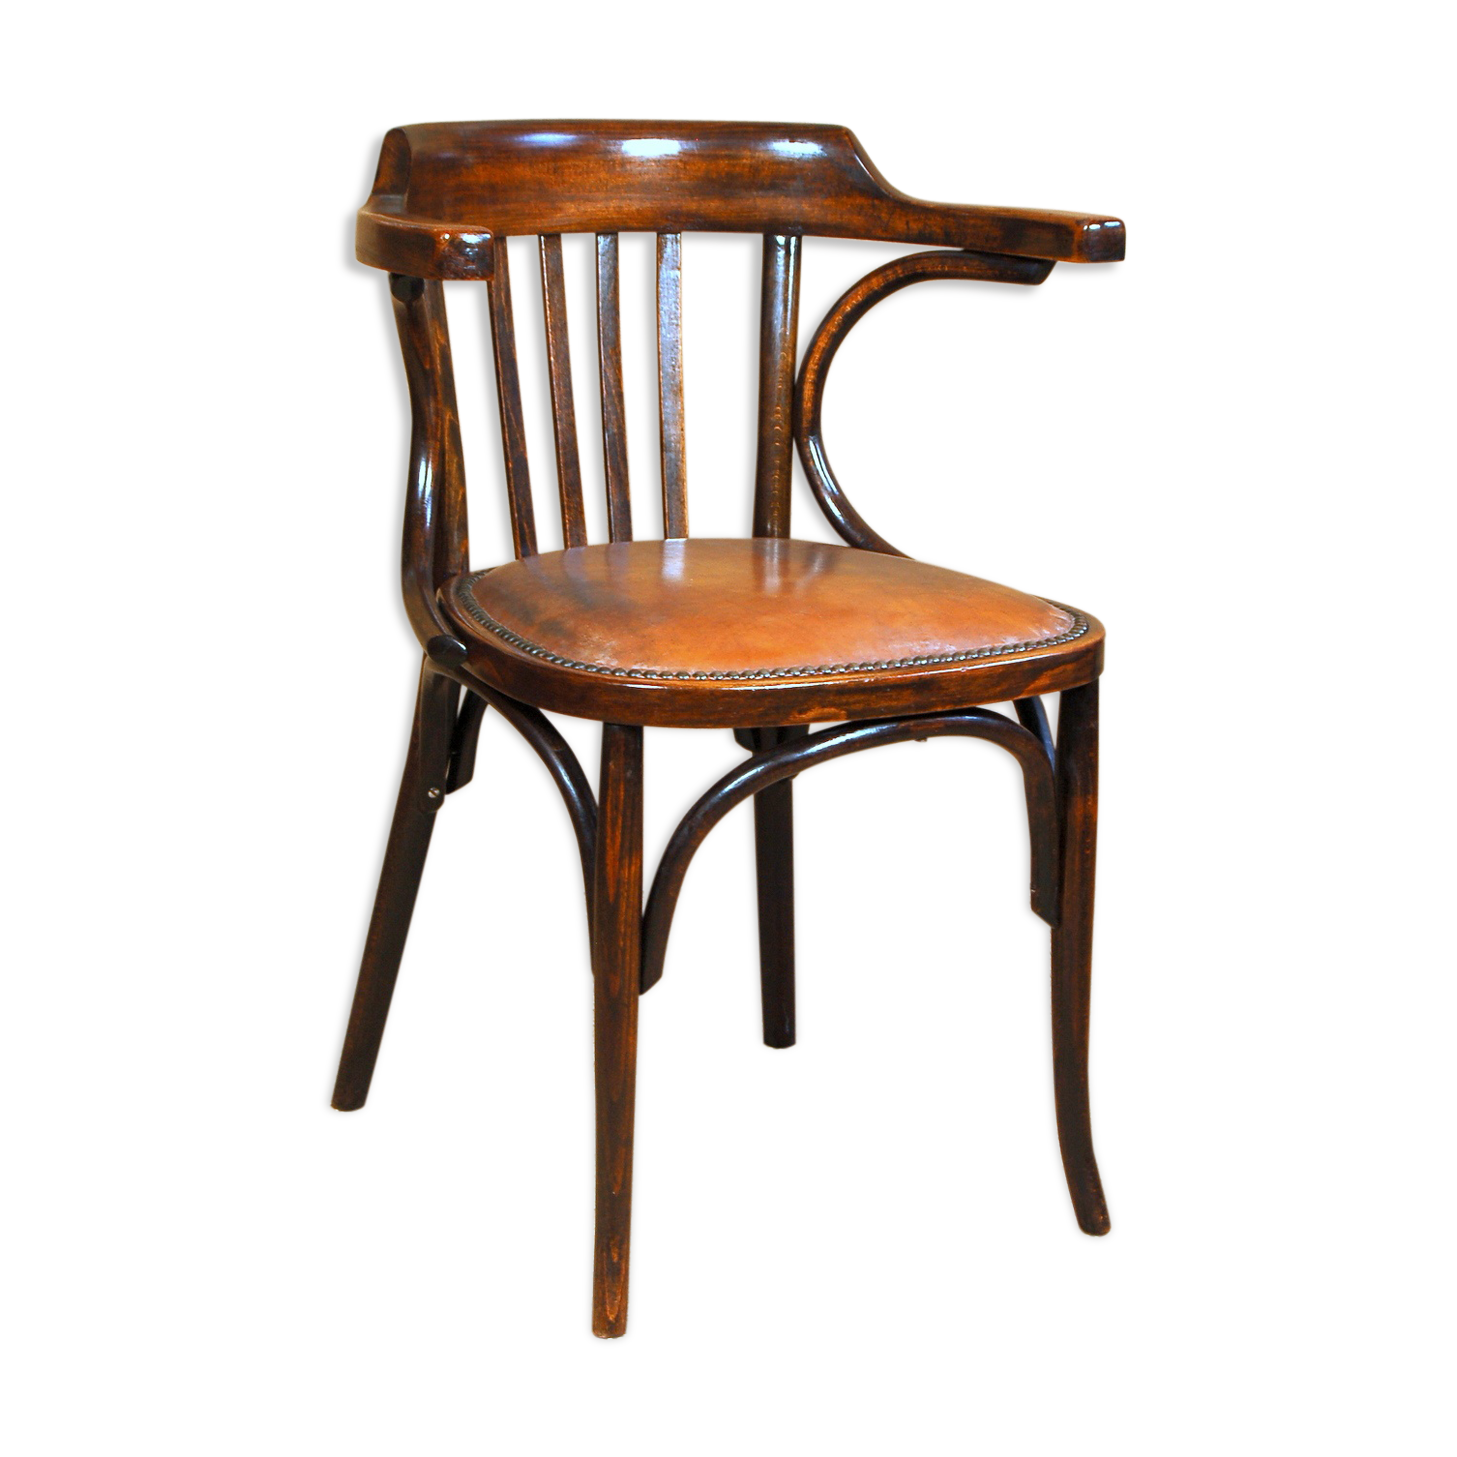 Fauteuil bureau baumann ca simili cuir bois matériau